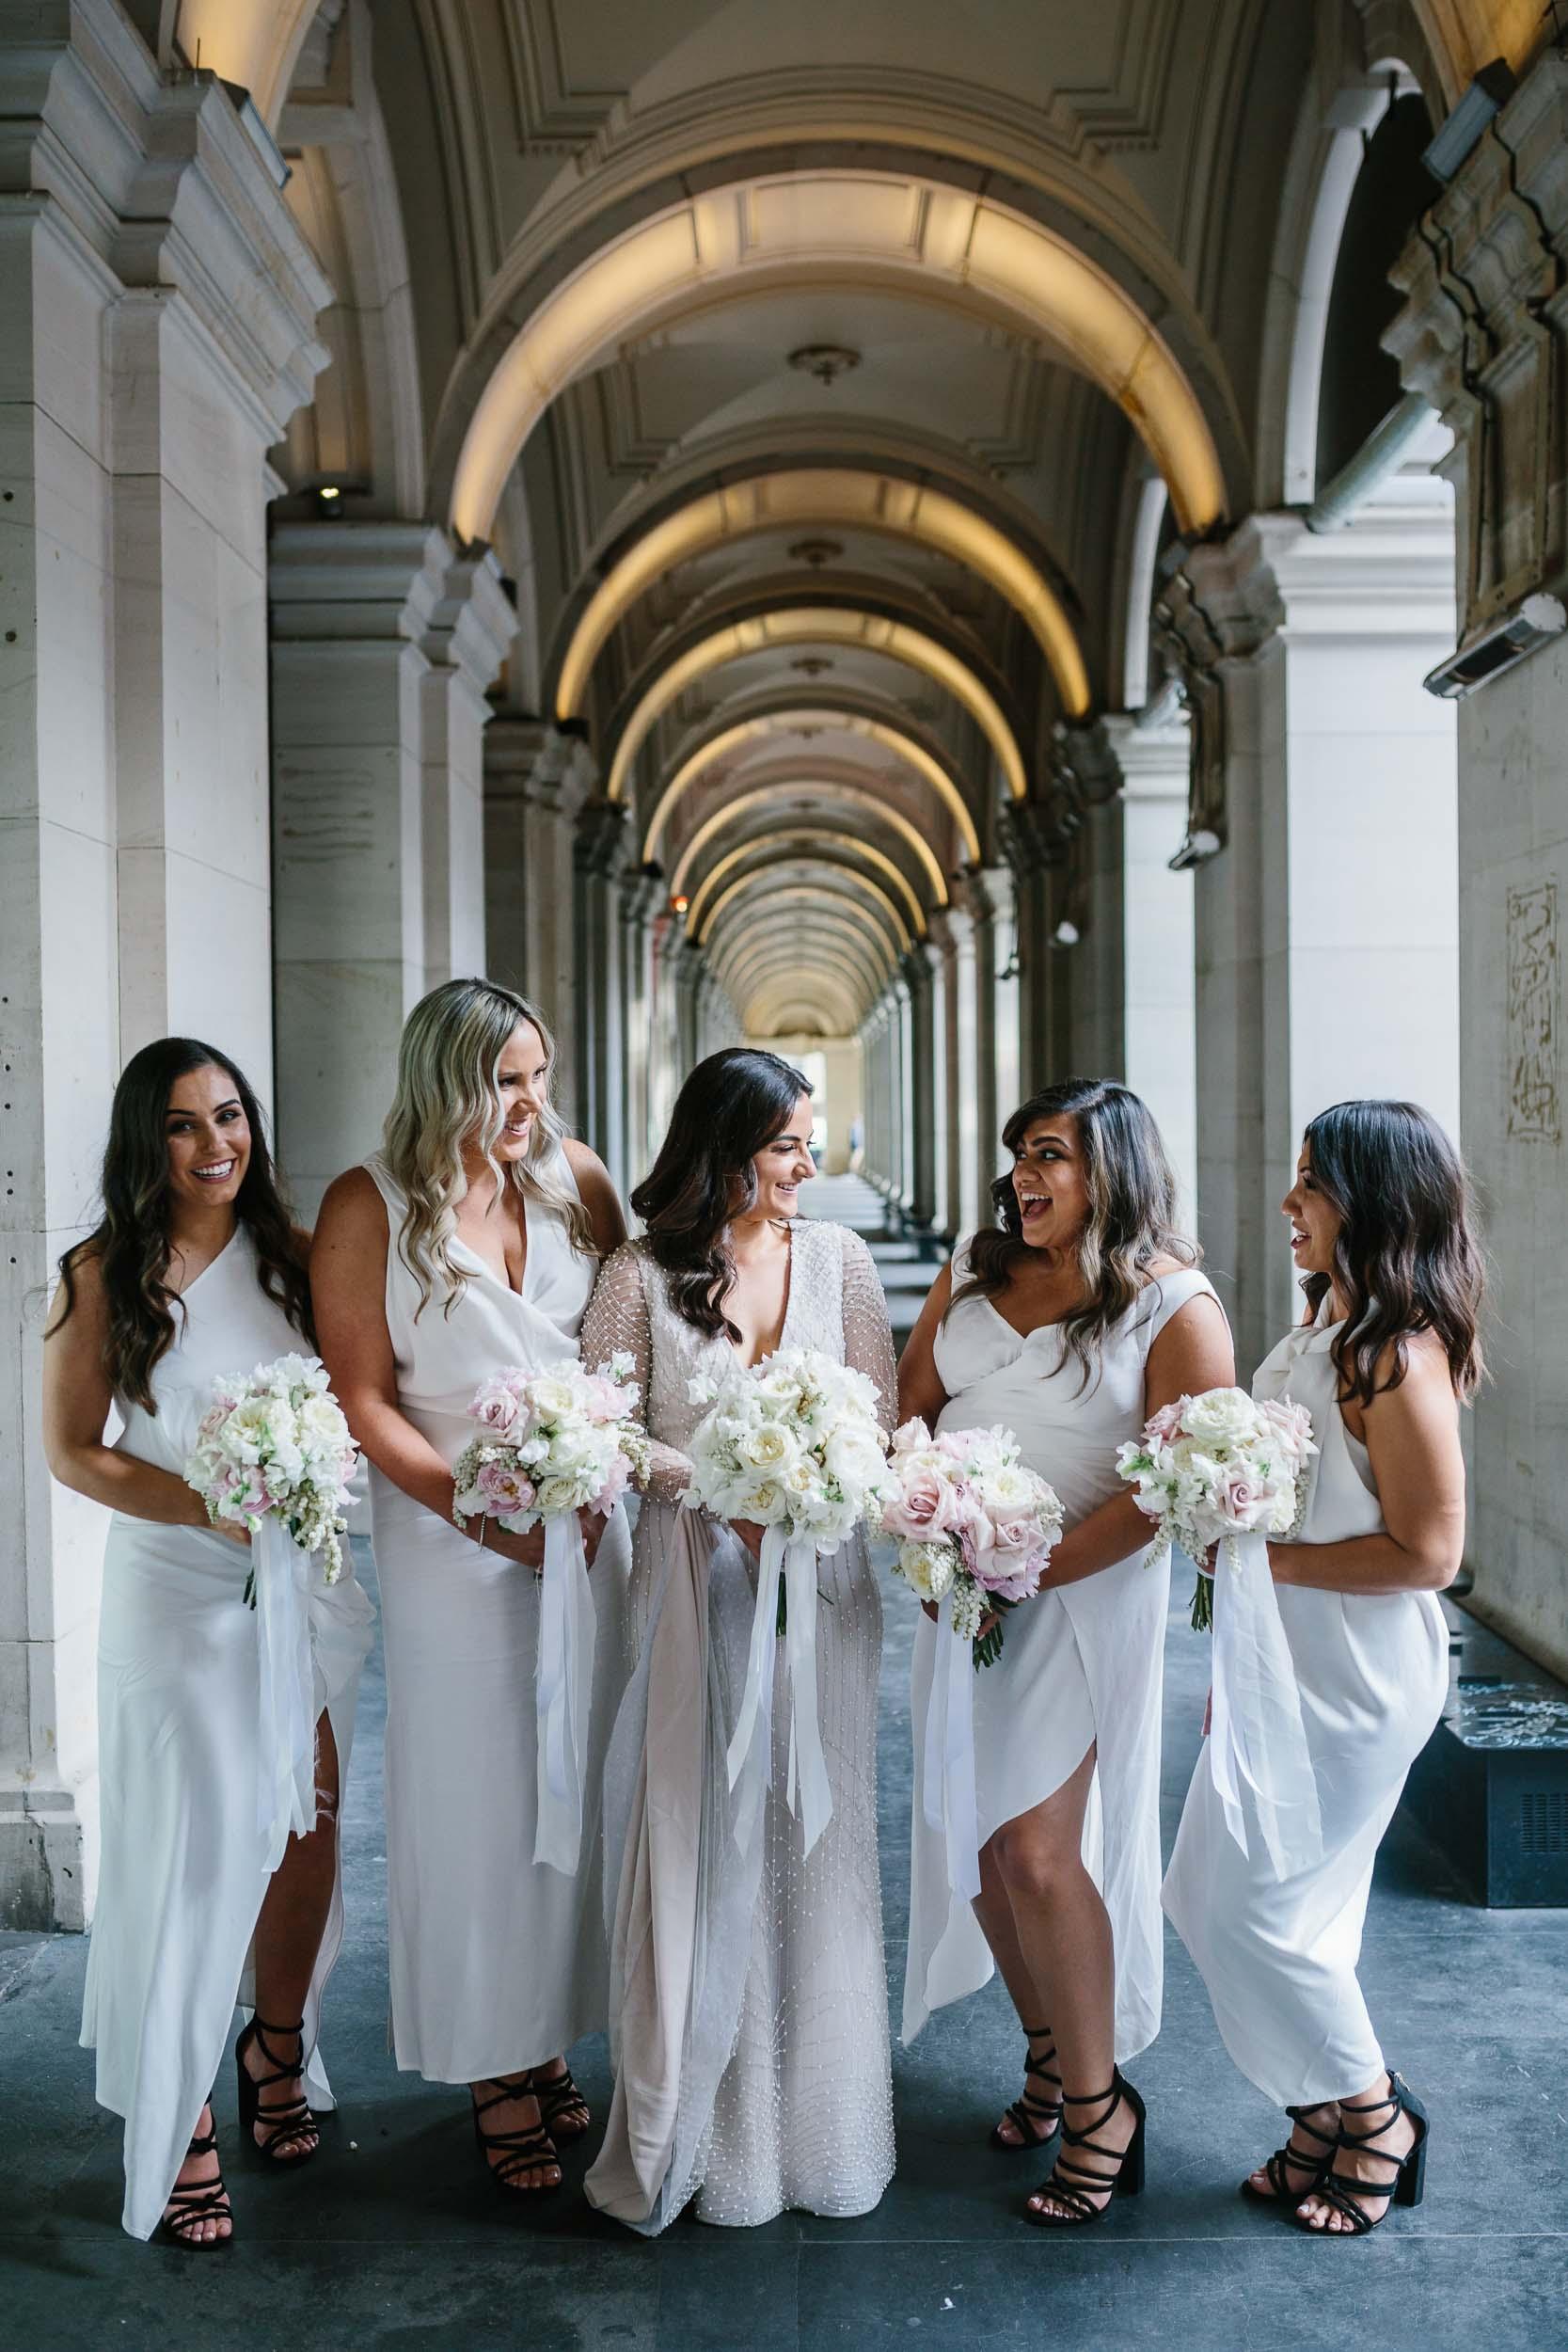 Kas-Richards-Wedding-Photographer-Melbourne-City-Wedding-Alto-Event-Space-Jane-Hill-Bridal-Gown-47.jpg